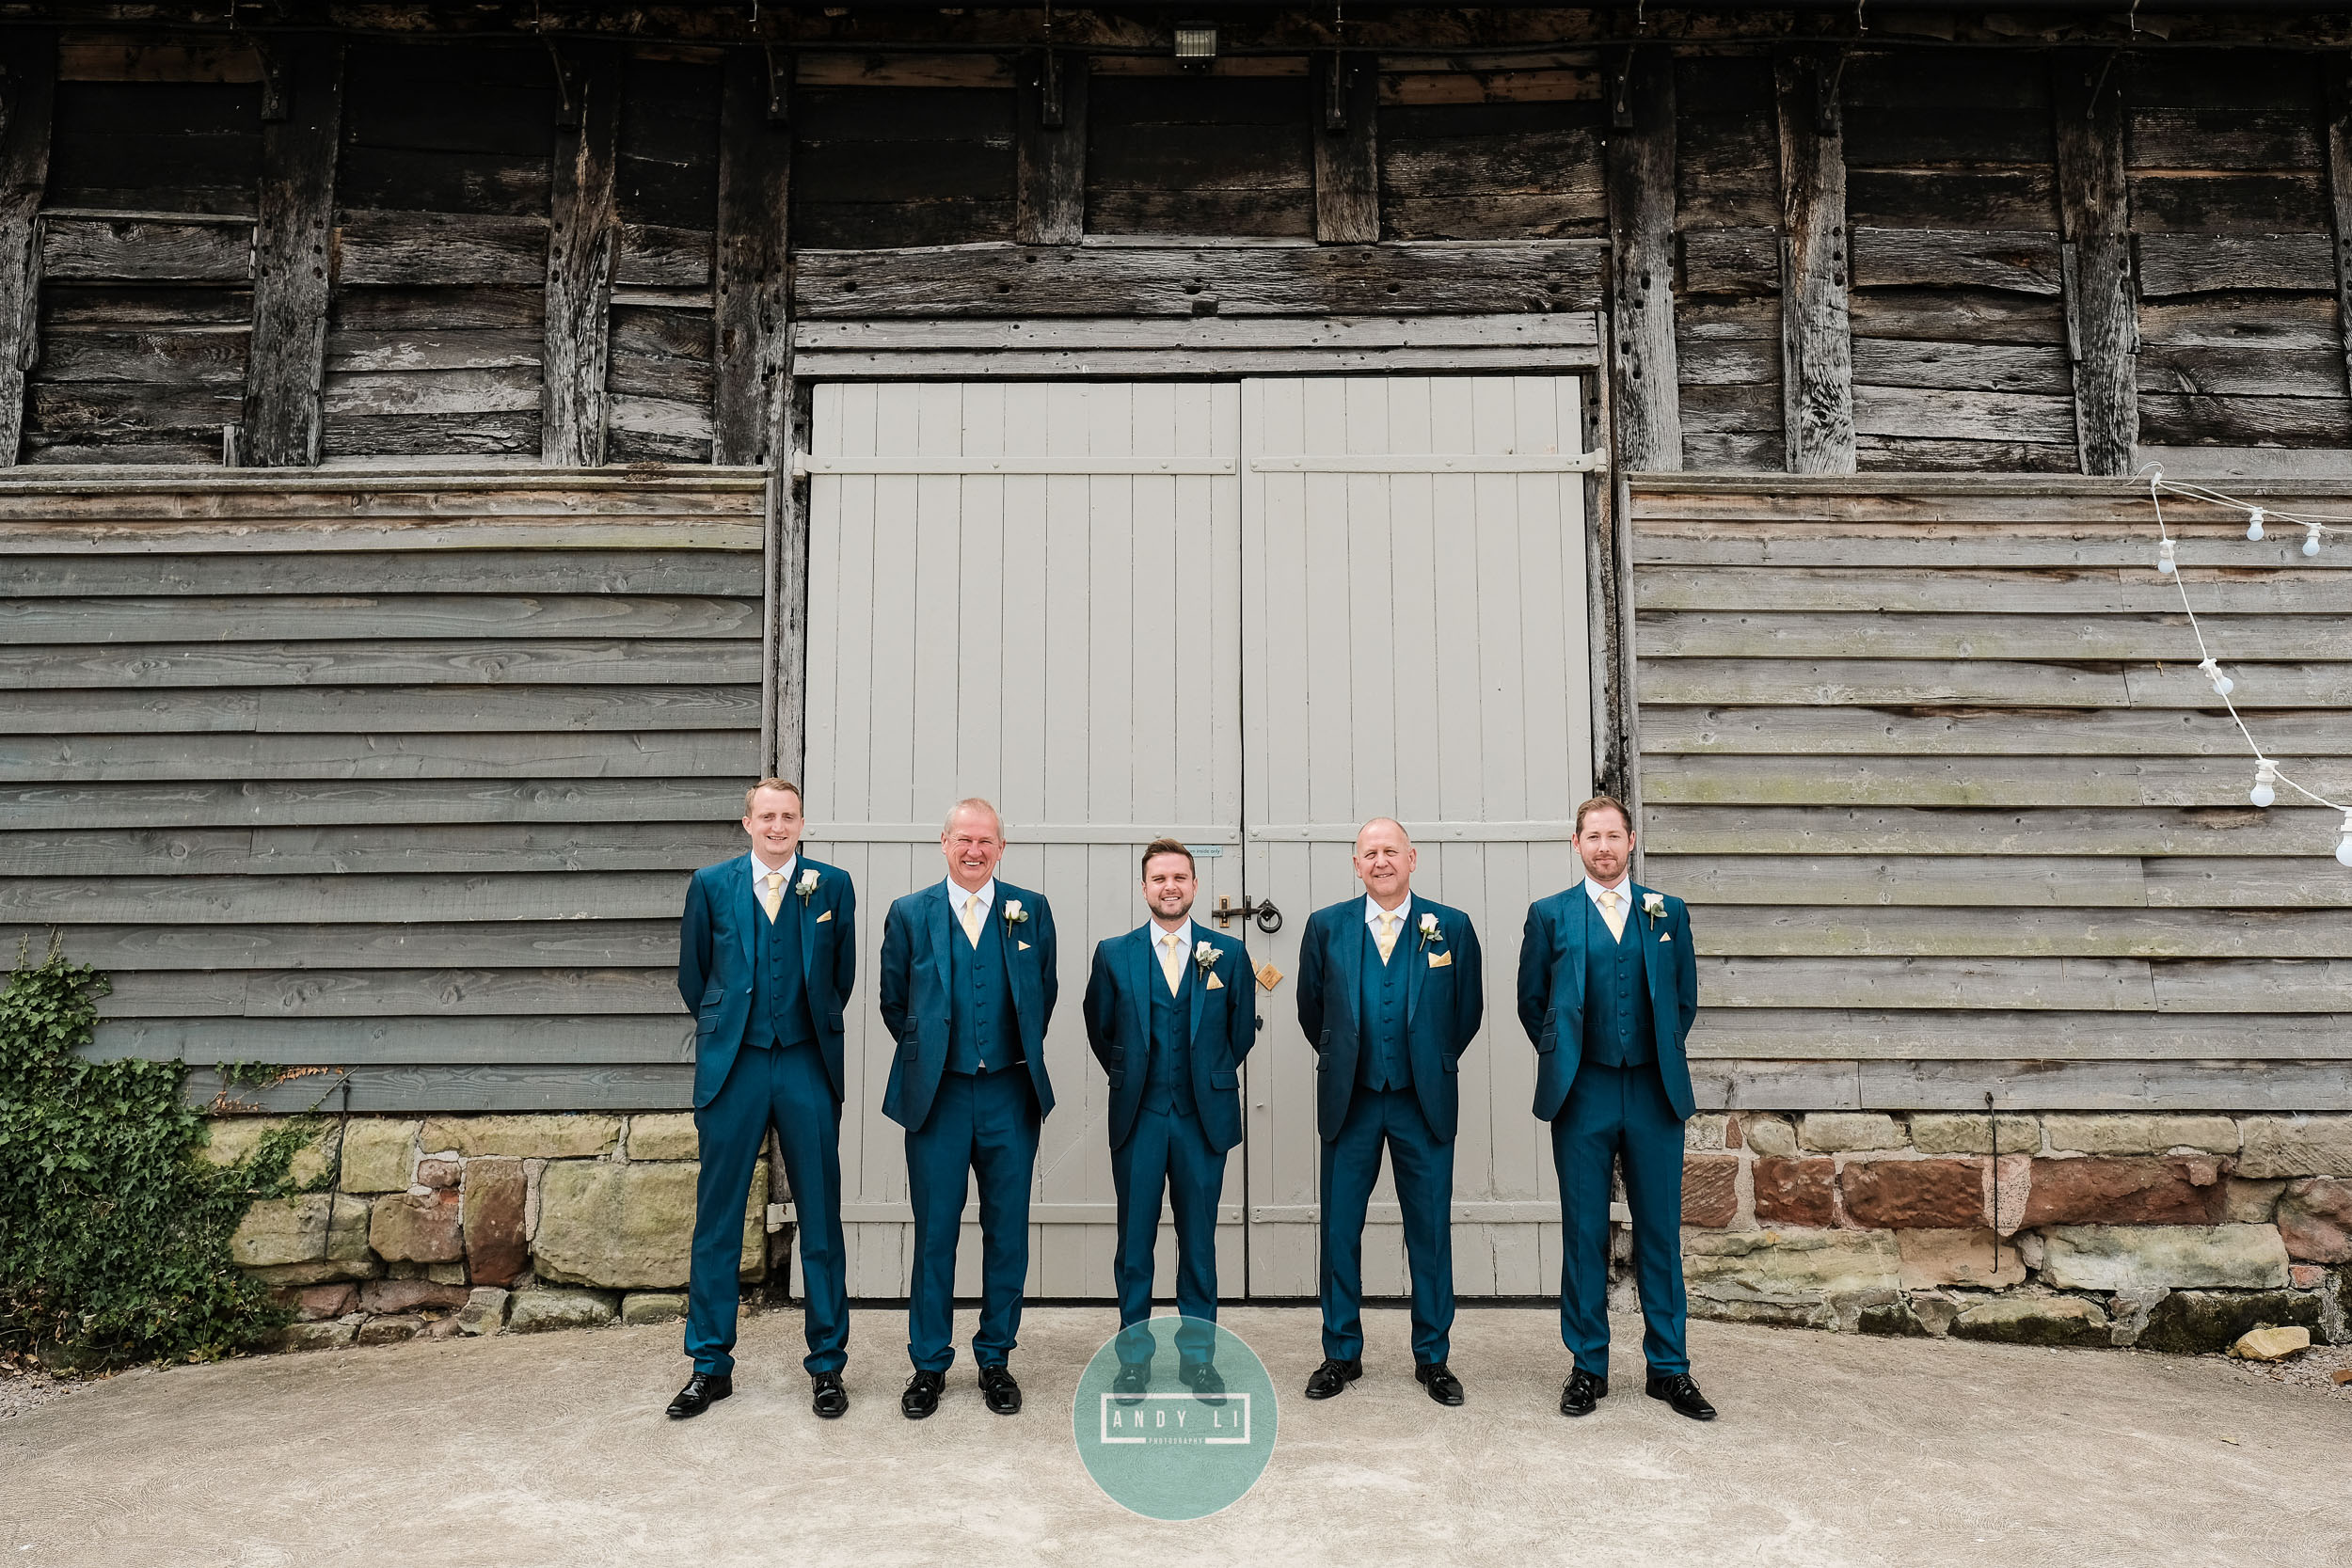 Pimhill Barn Wedding Photographer-018-XPRO5864.jpg